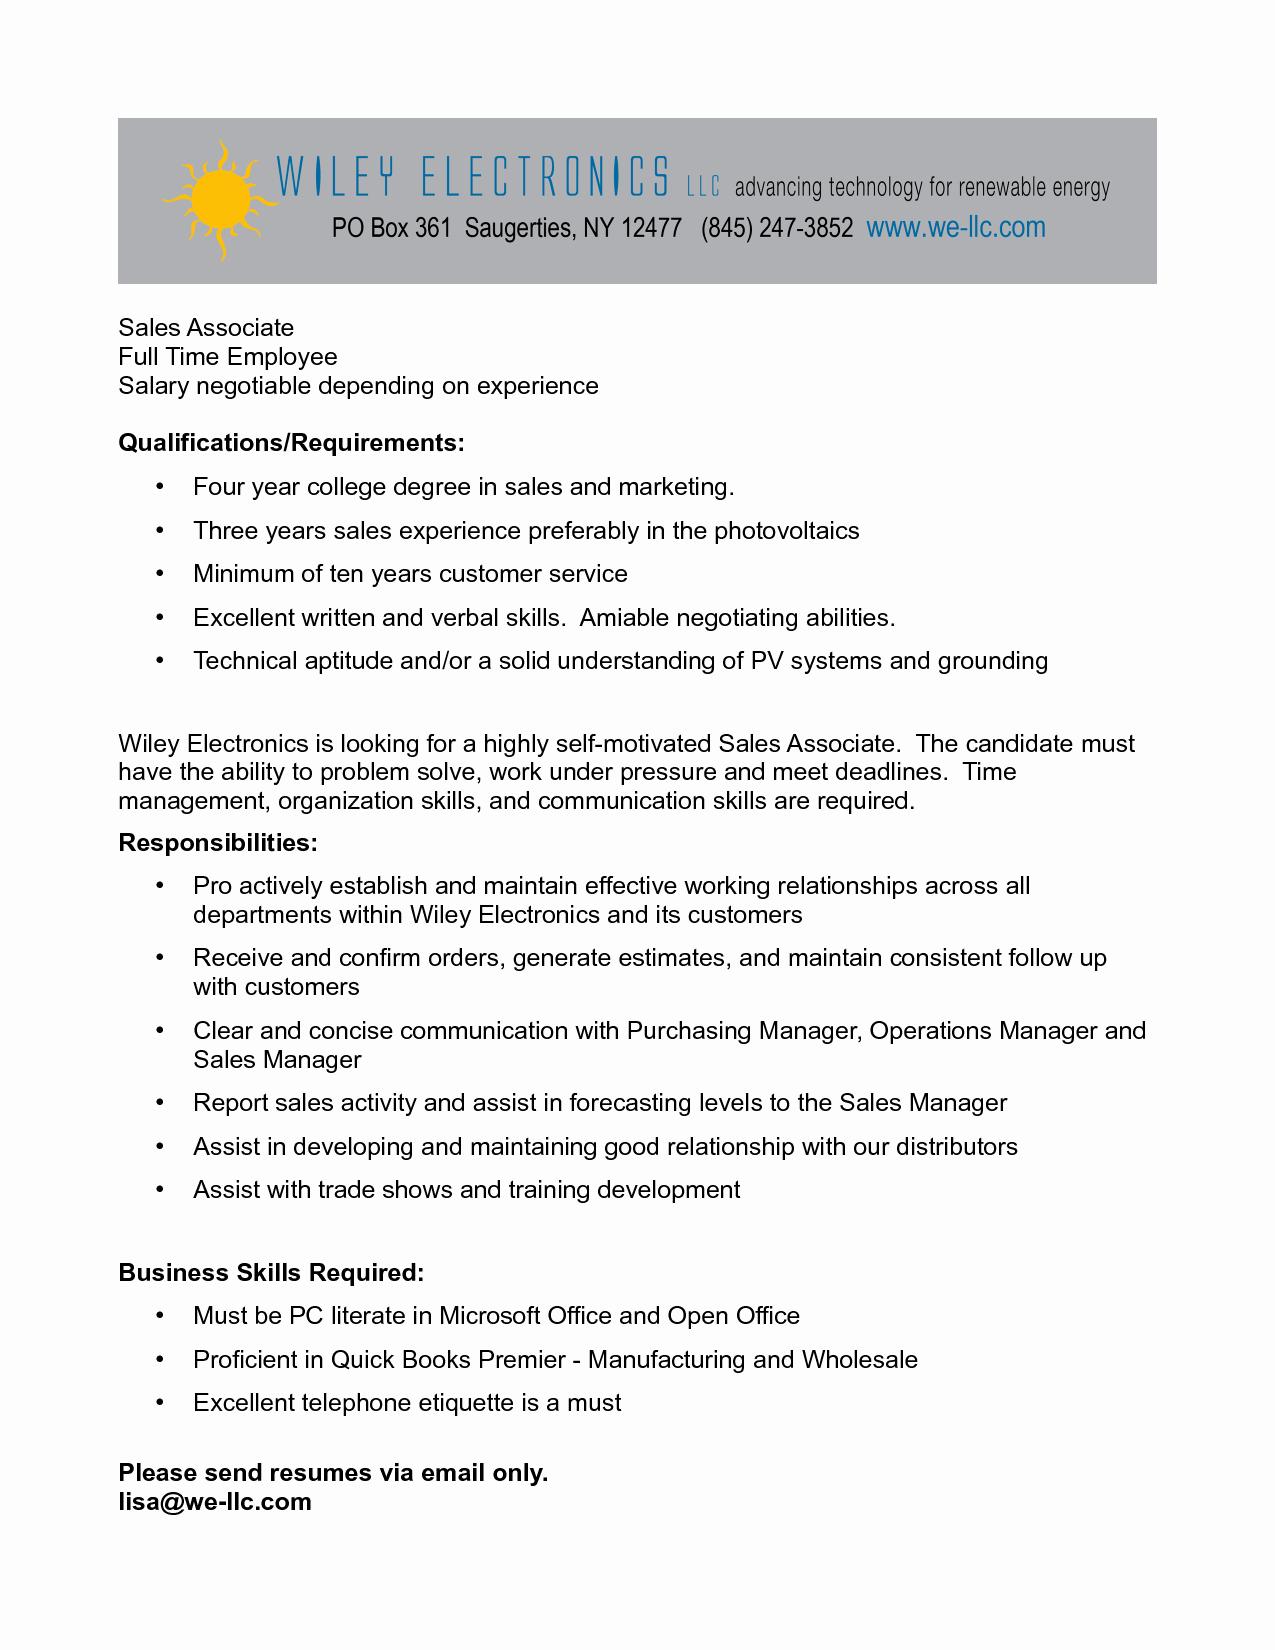 Resume Retail Sales associate Duties